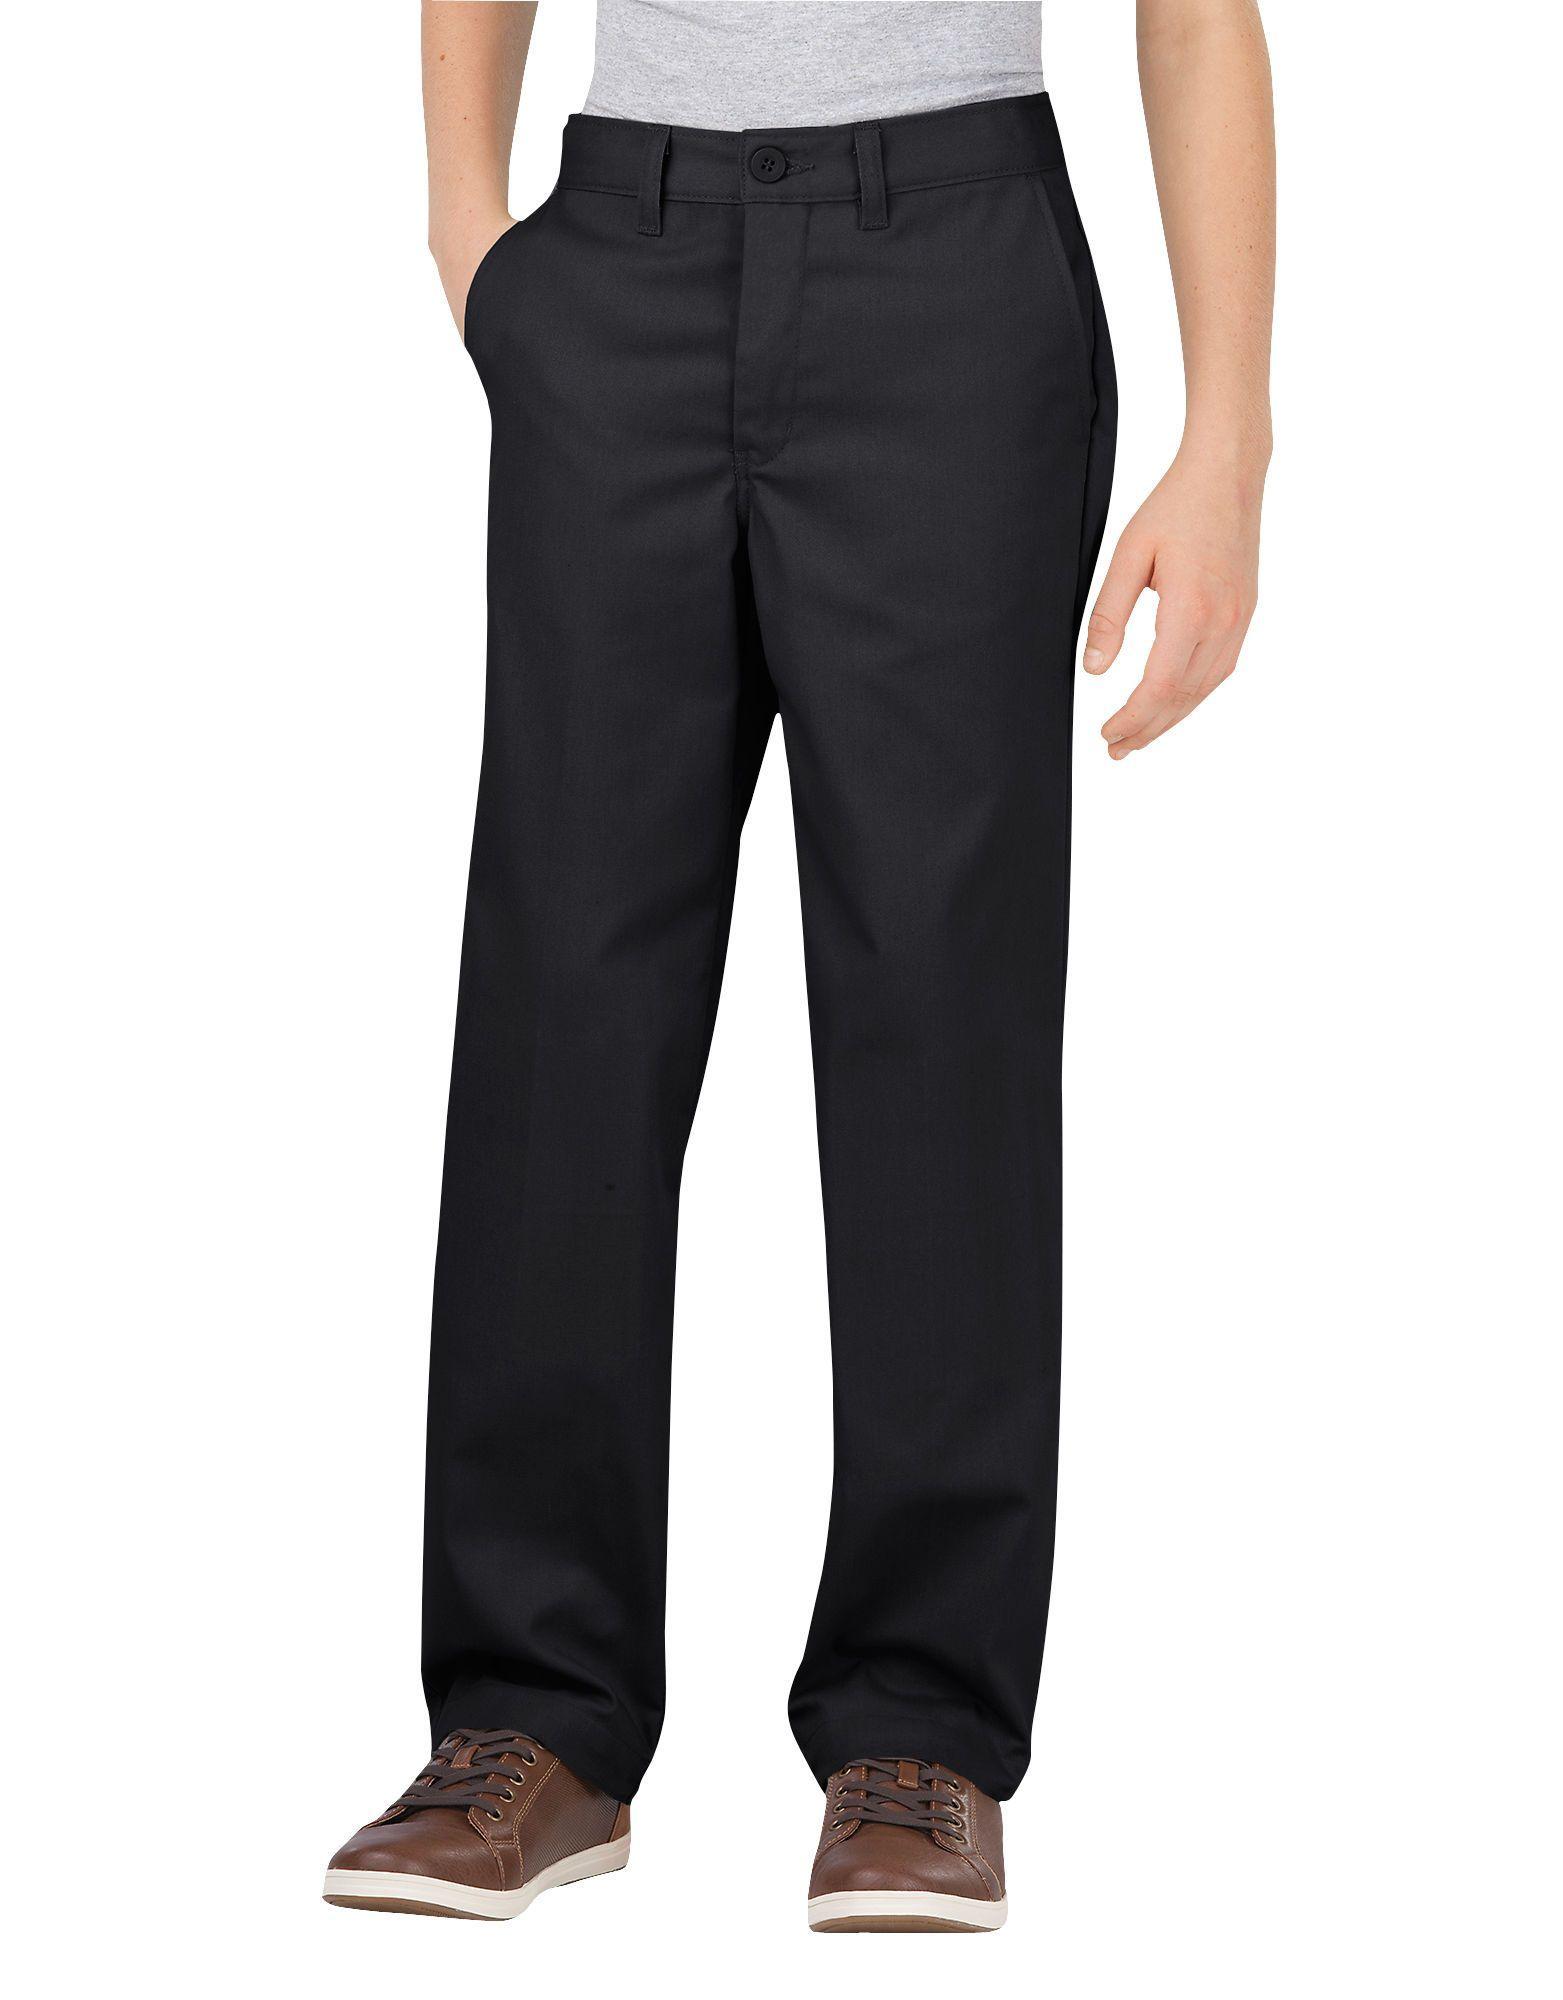 f712b063da5cd Buy Cvc Perf Pant 8-20 - Dickies Online at Best price - NY